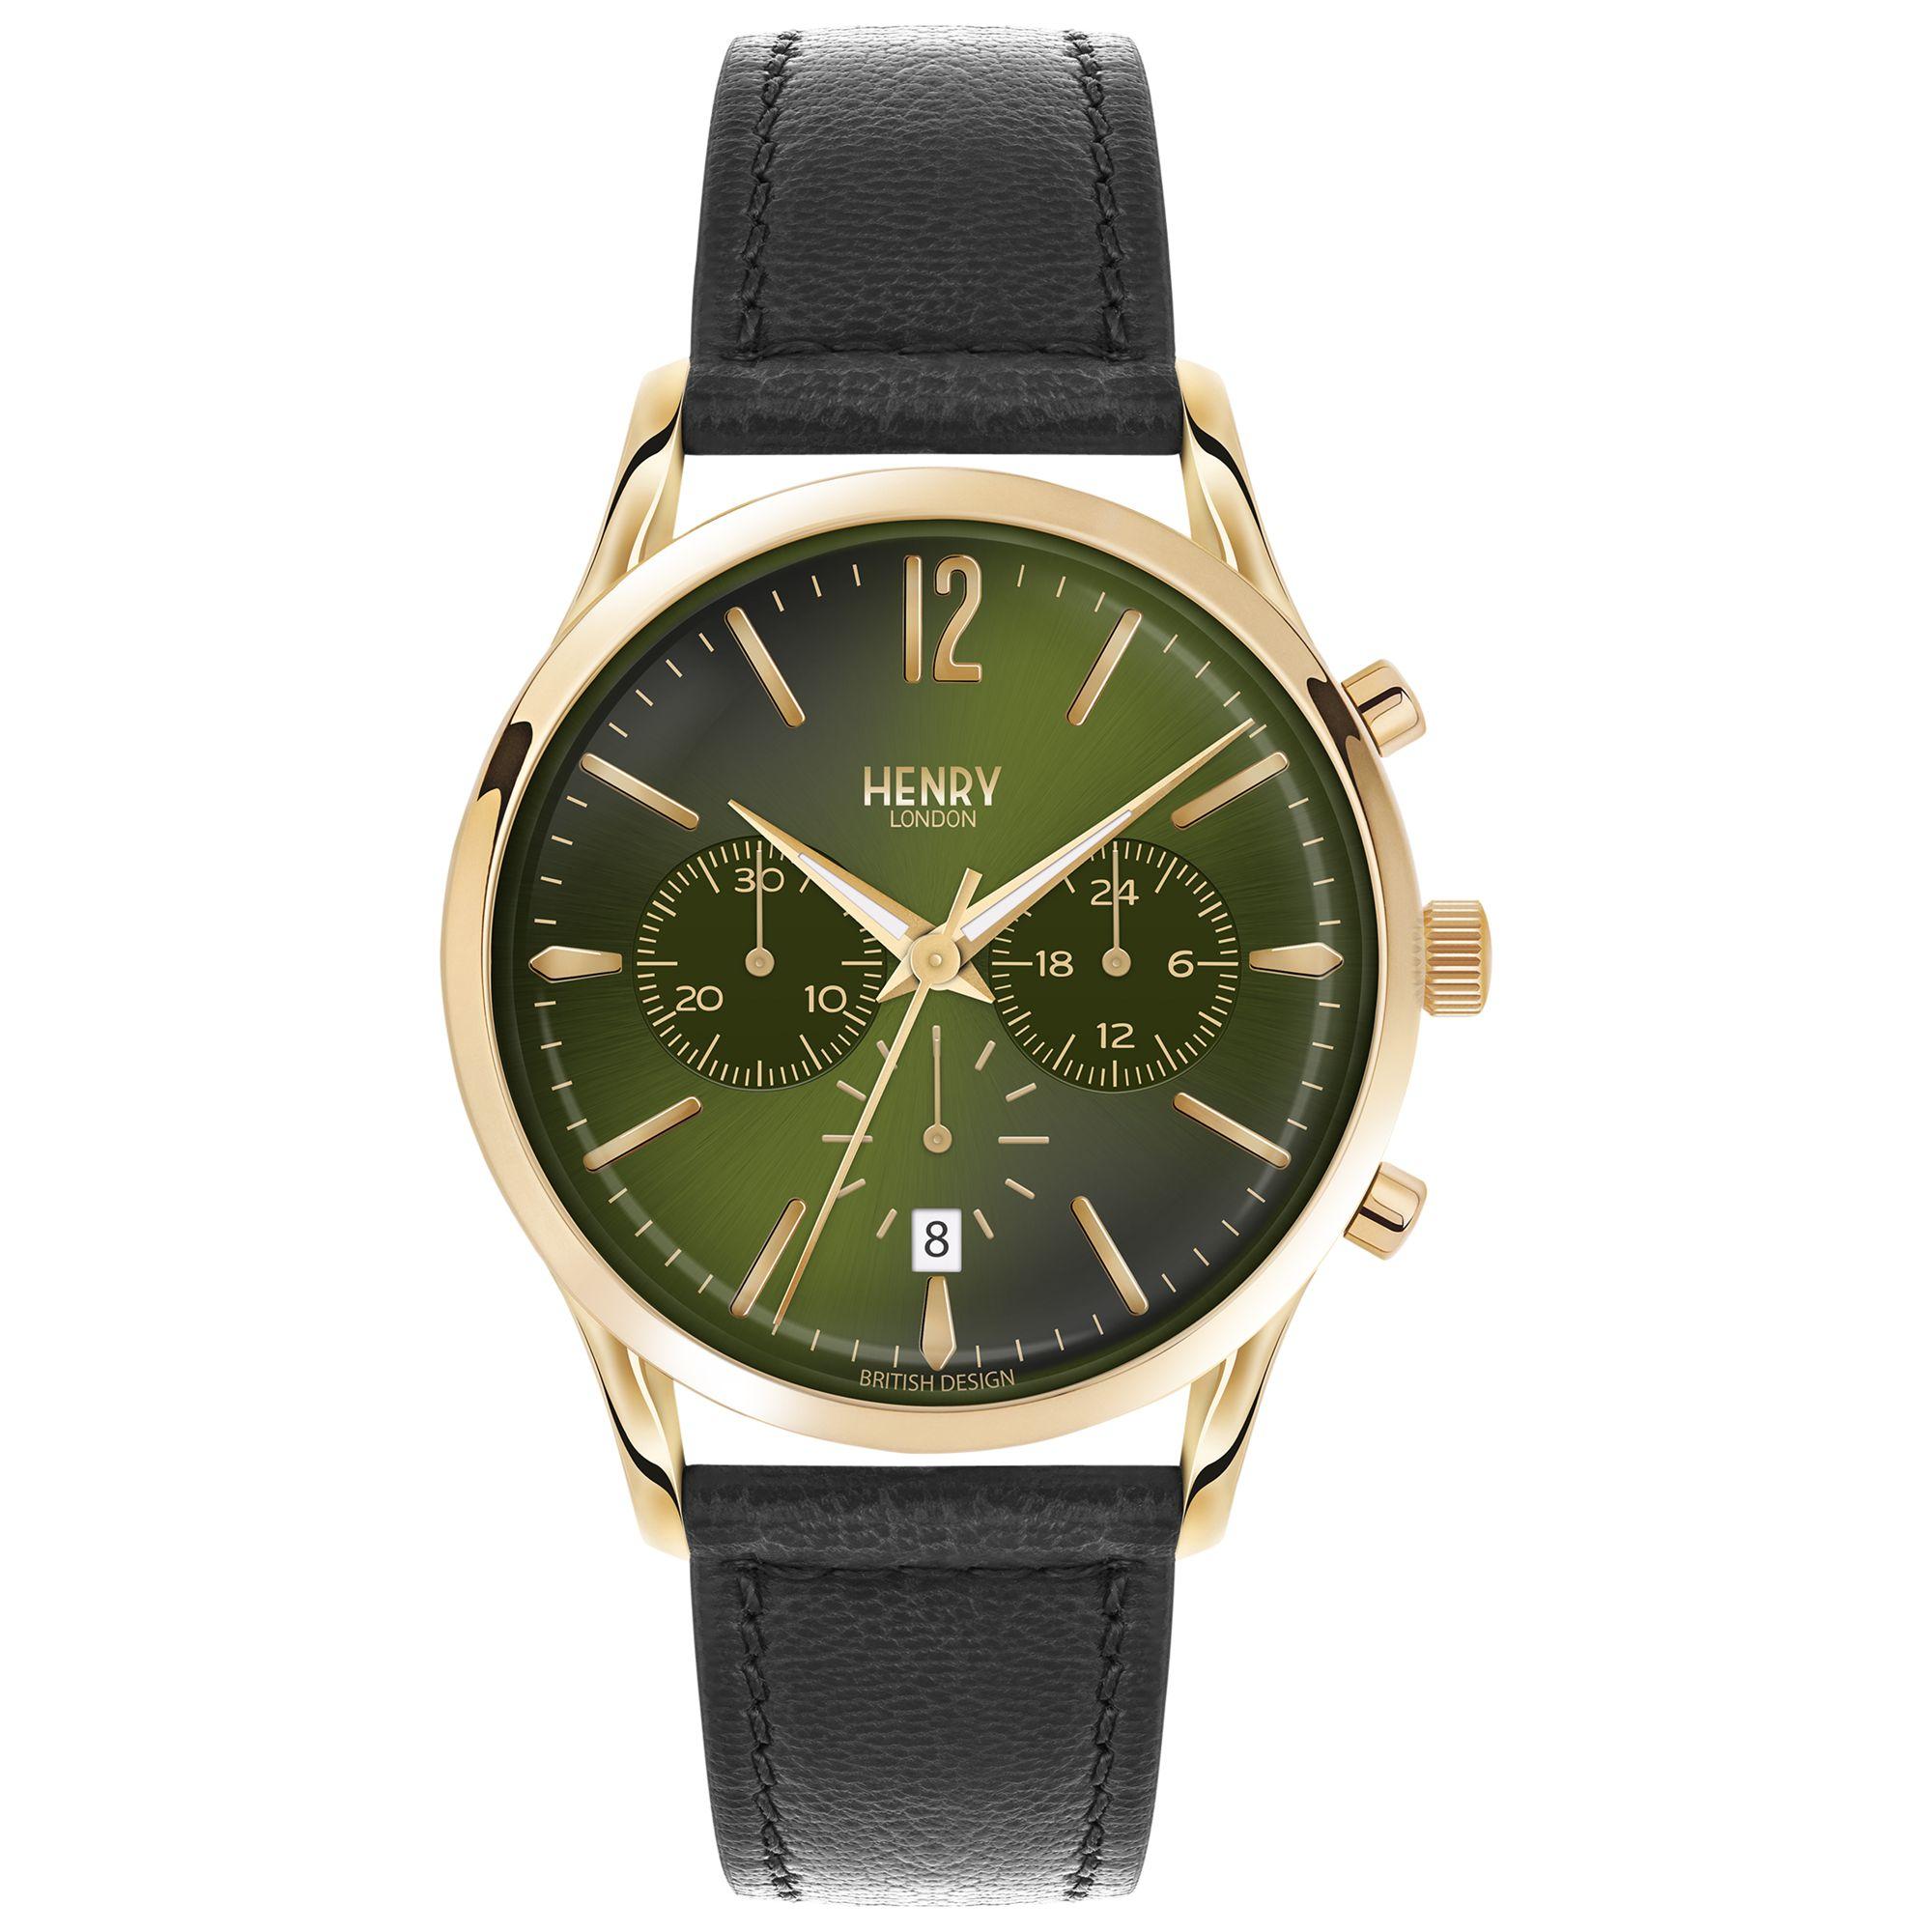 Henry London Henry London HL41-CS-0106 Men's Chiswick Chronograph Date Leather Strap Watch, Black/Dark Green